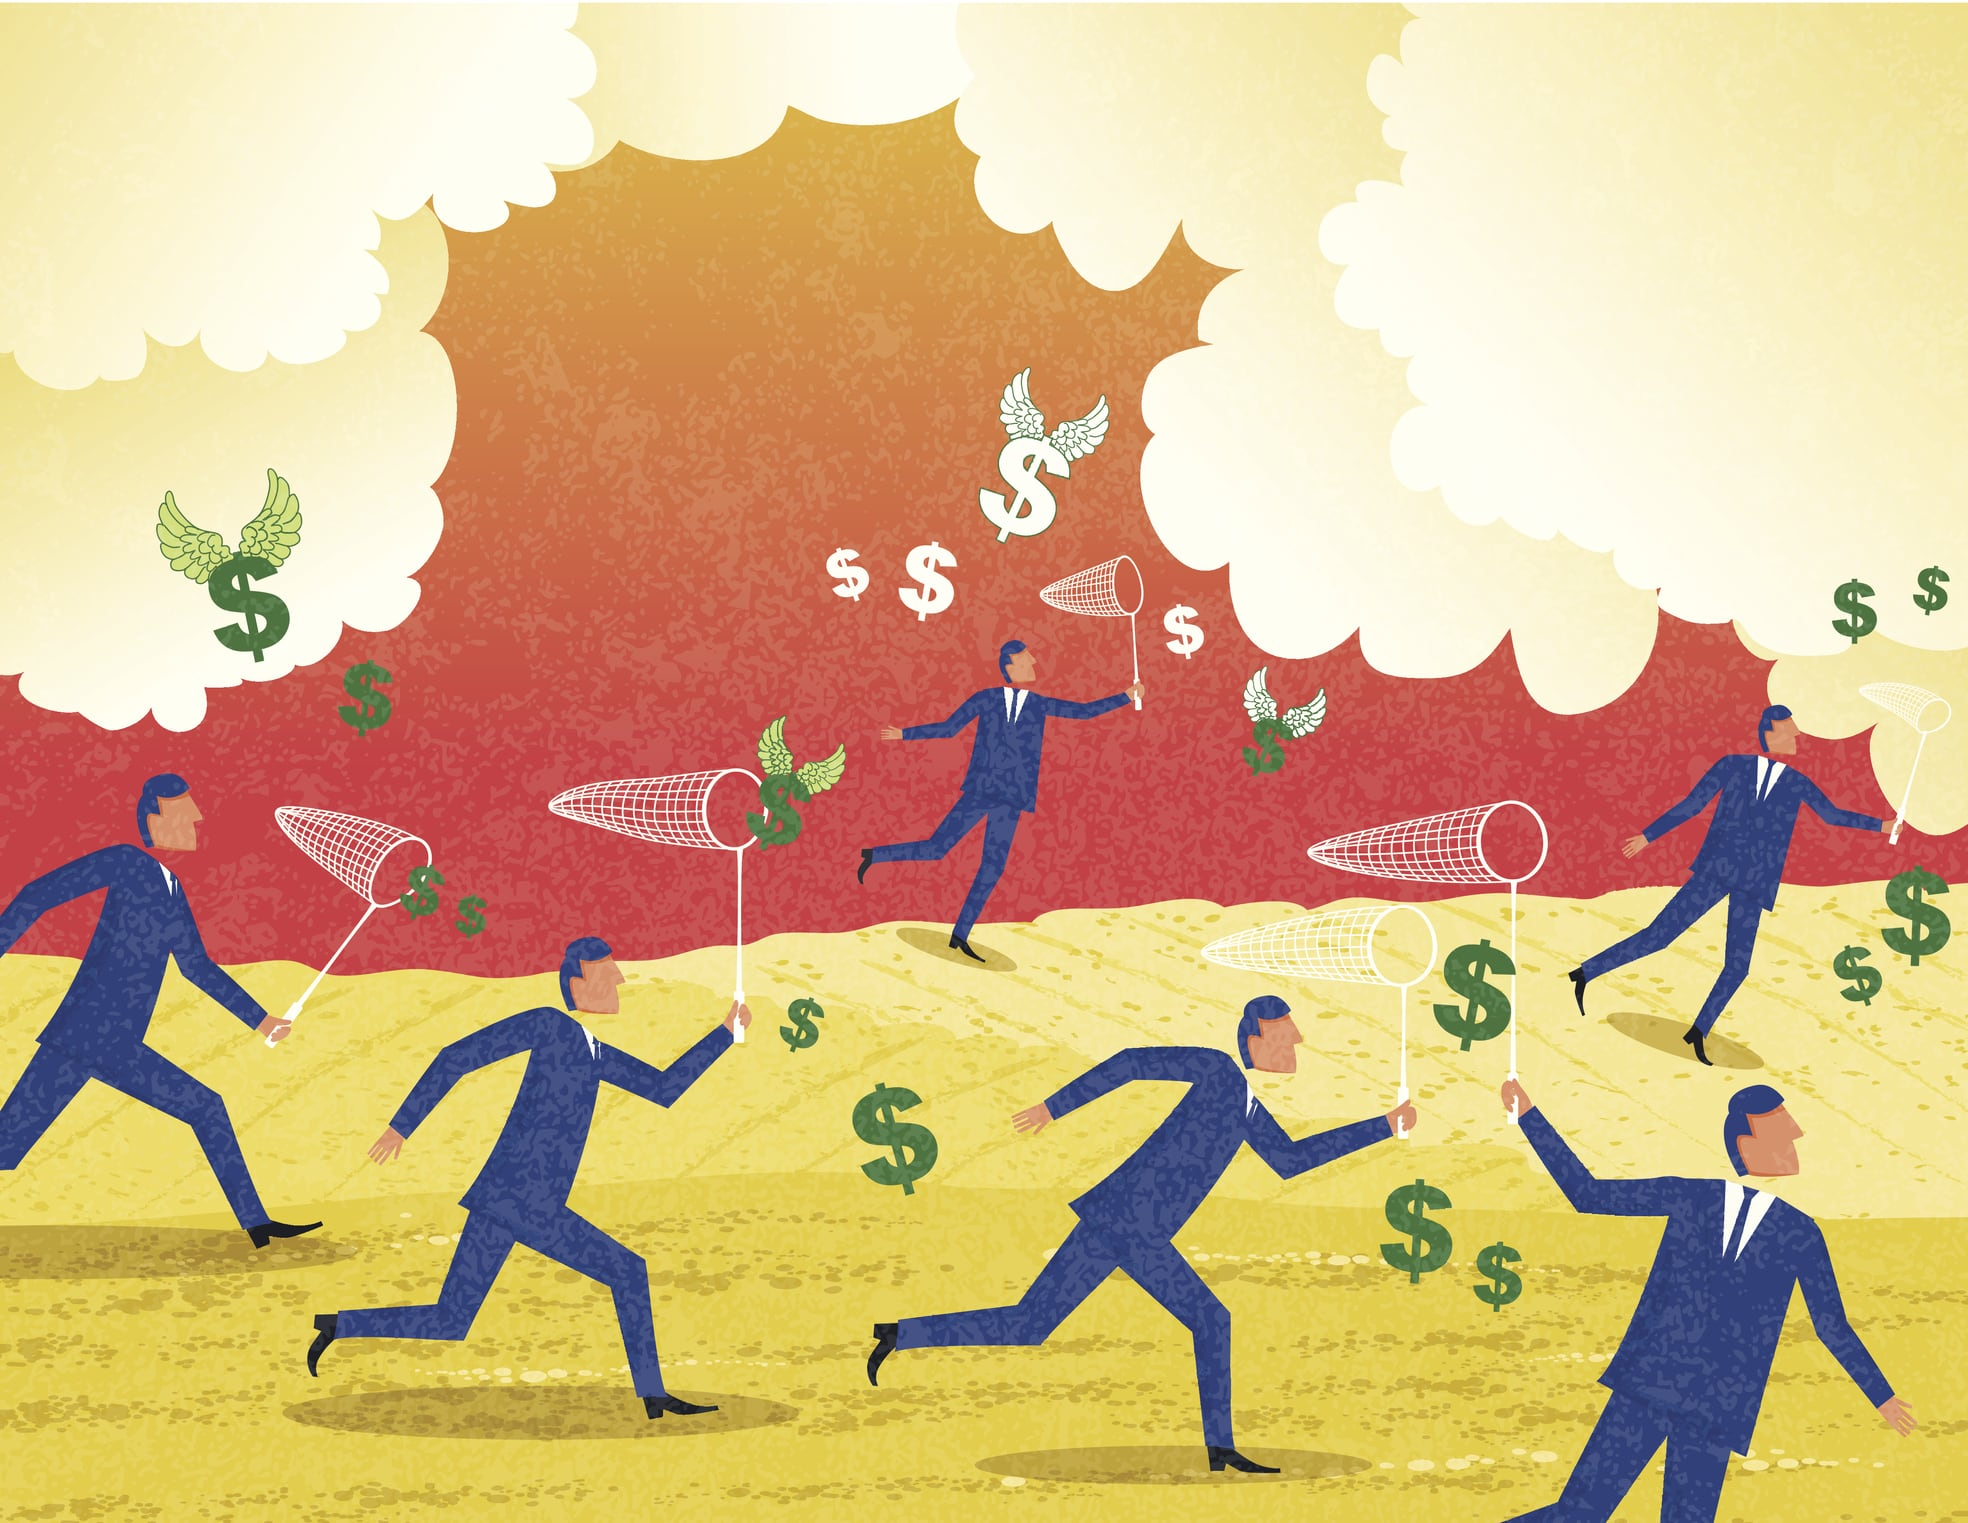 chasing_money.